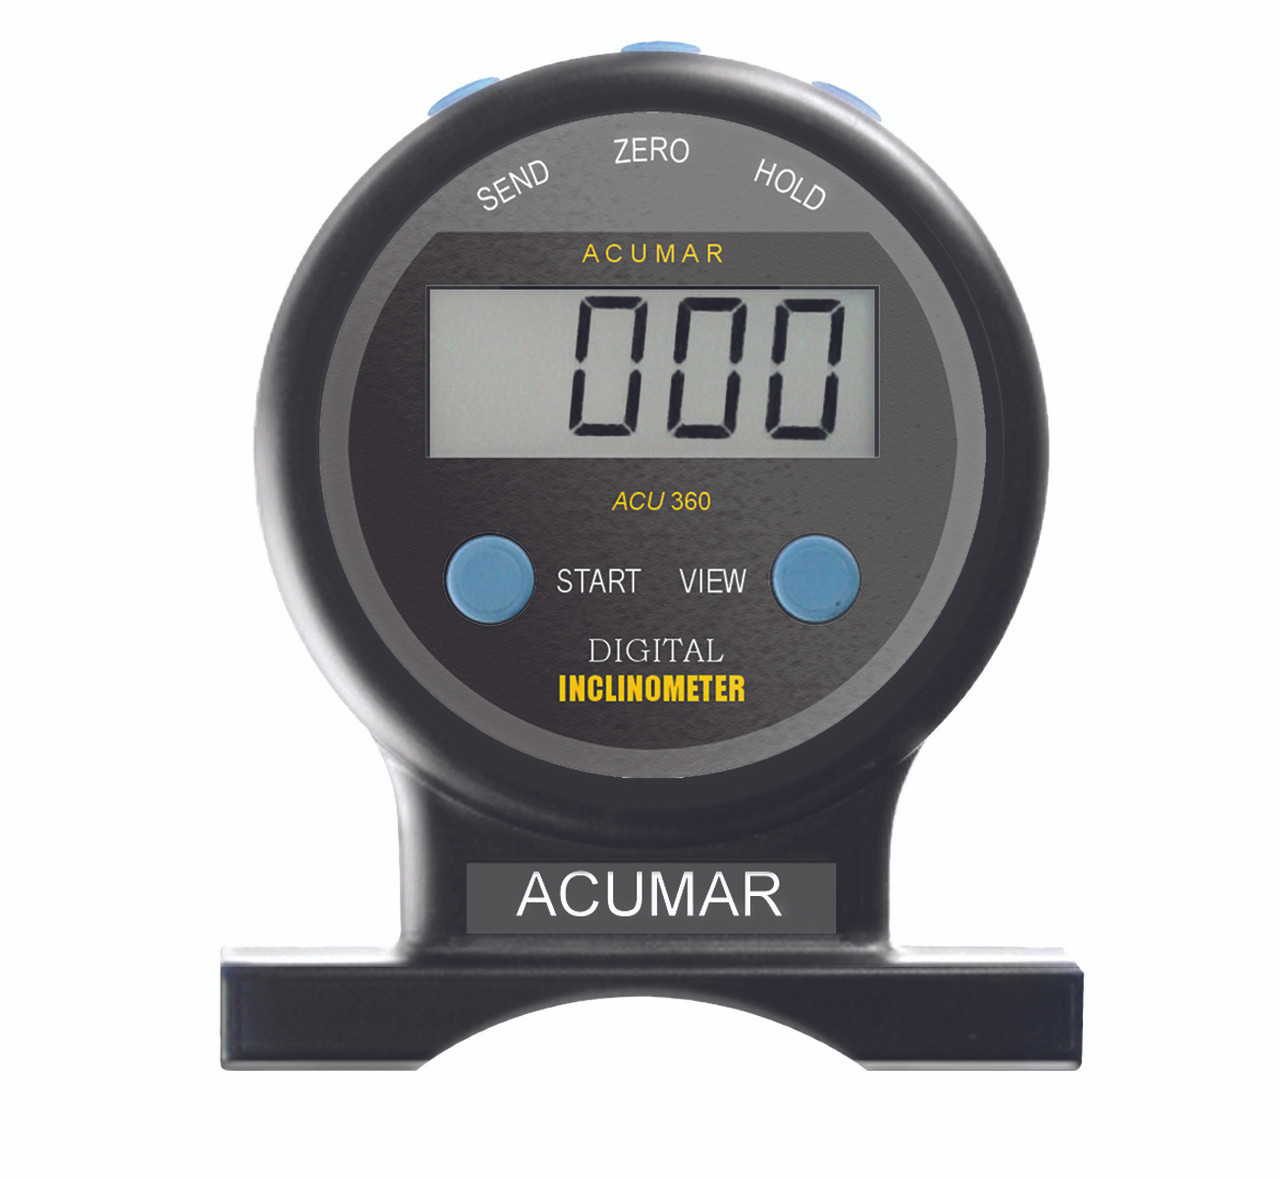 Acumar Inclinometer - Single Inclinometer